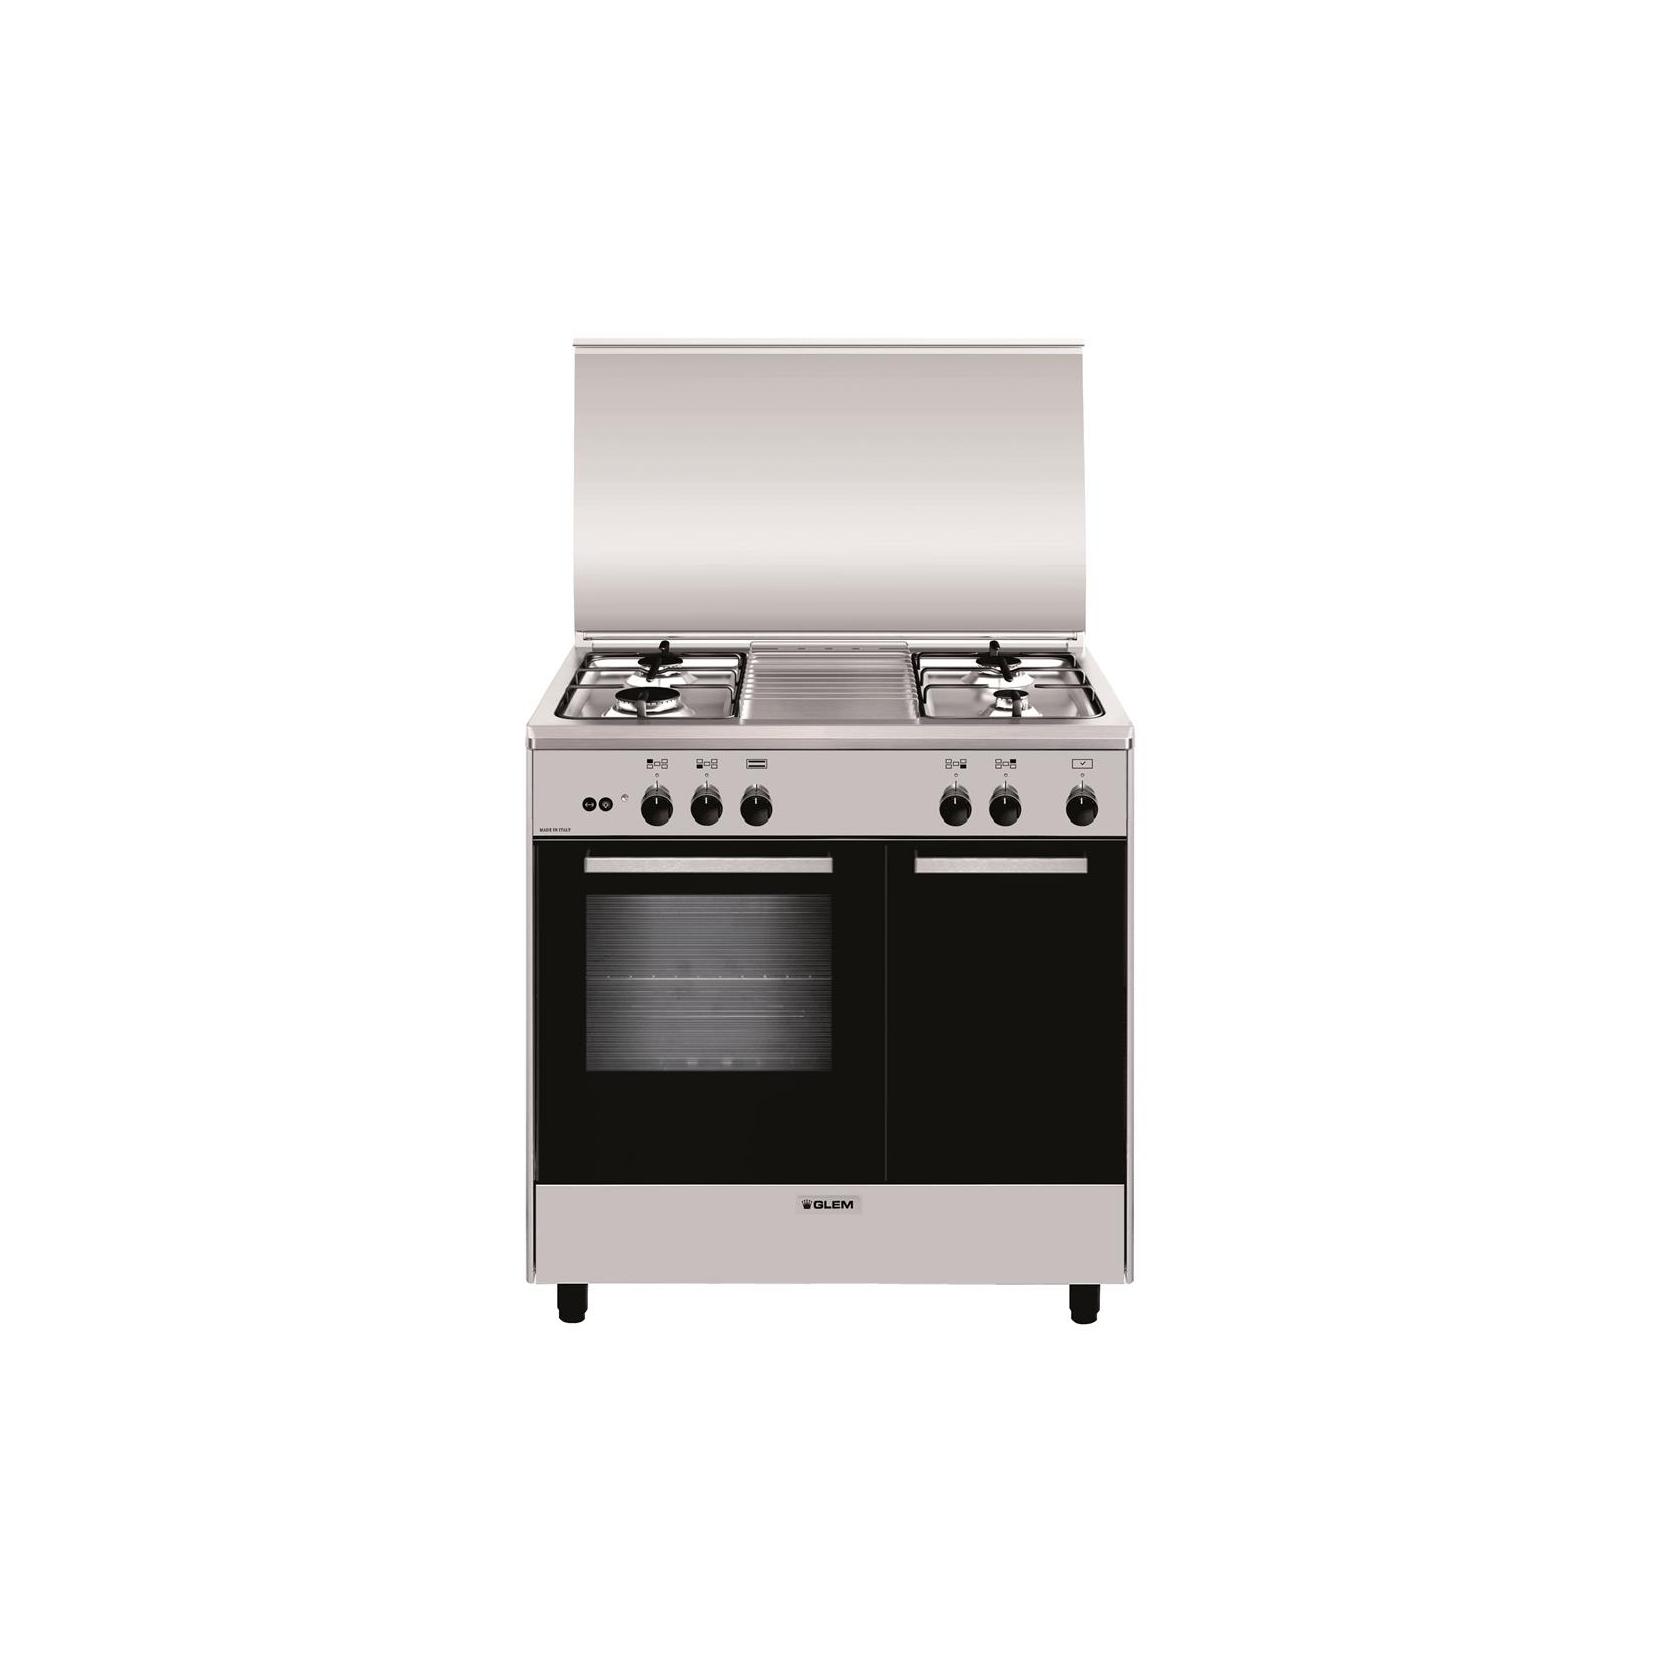 Glem cucina a gas ar854gi 4 fuochi a gas forno a gas classe a 80x50 cm colore inox garanzia - Cucine a gas samsung ...